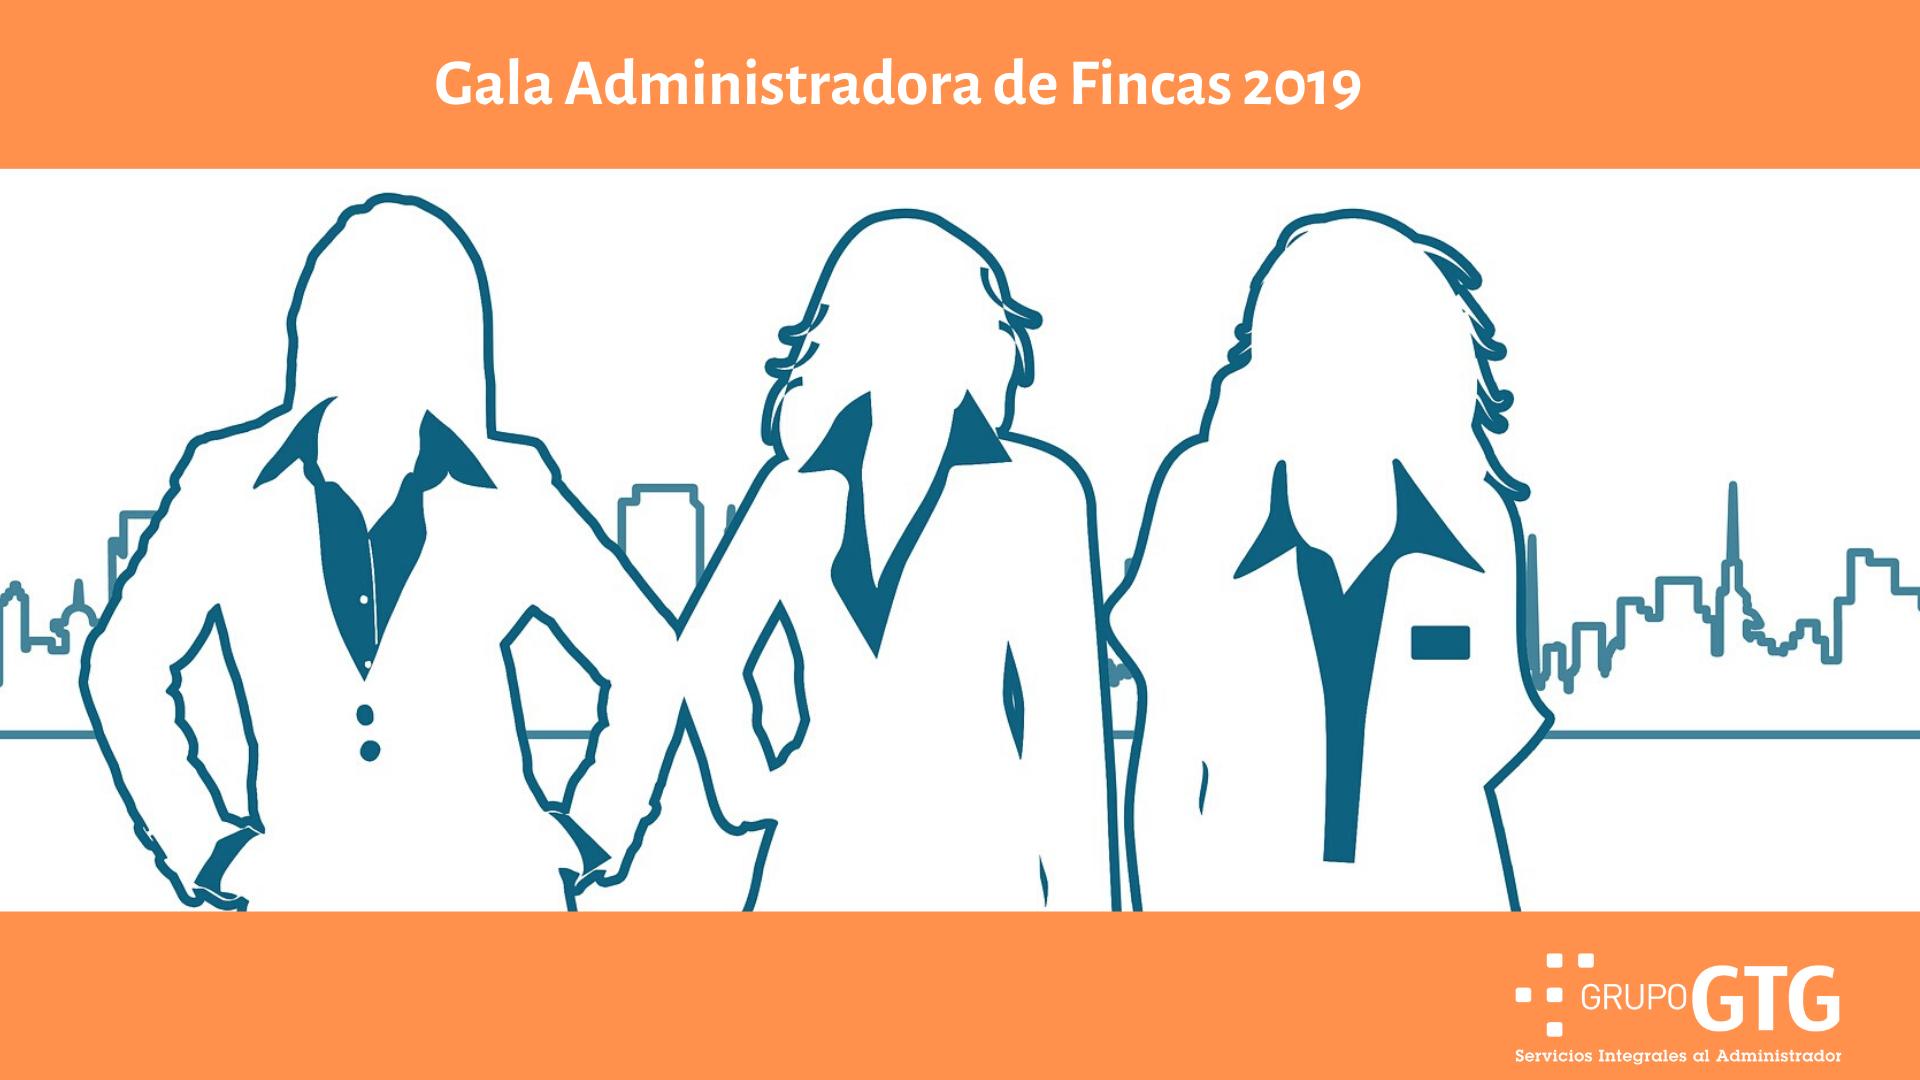 Gala Administradoras de Fincas 2019